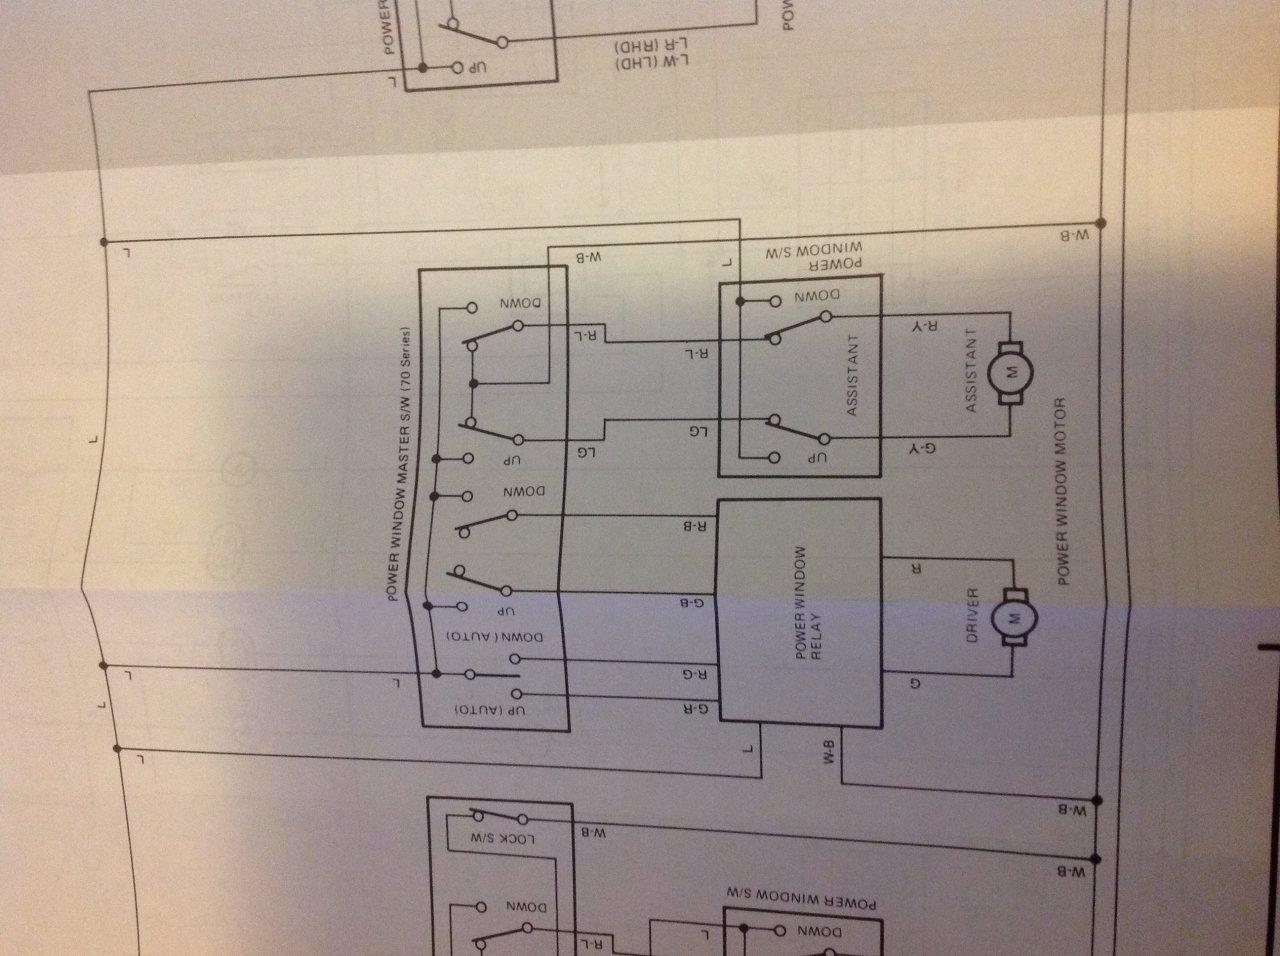 DH_0735] Myvi Power Window Wiring Diagram Wiring Diagram   Myvi Power Window Wiring Diagram      Onom Ginia Sulf Proe Waro Sputa Jebrp Faun Attr Benkeme Mohammedshrine  Librar Wiring 101